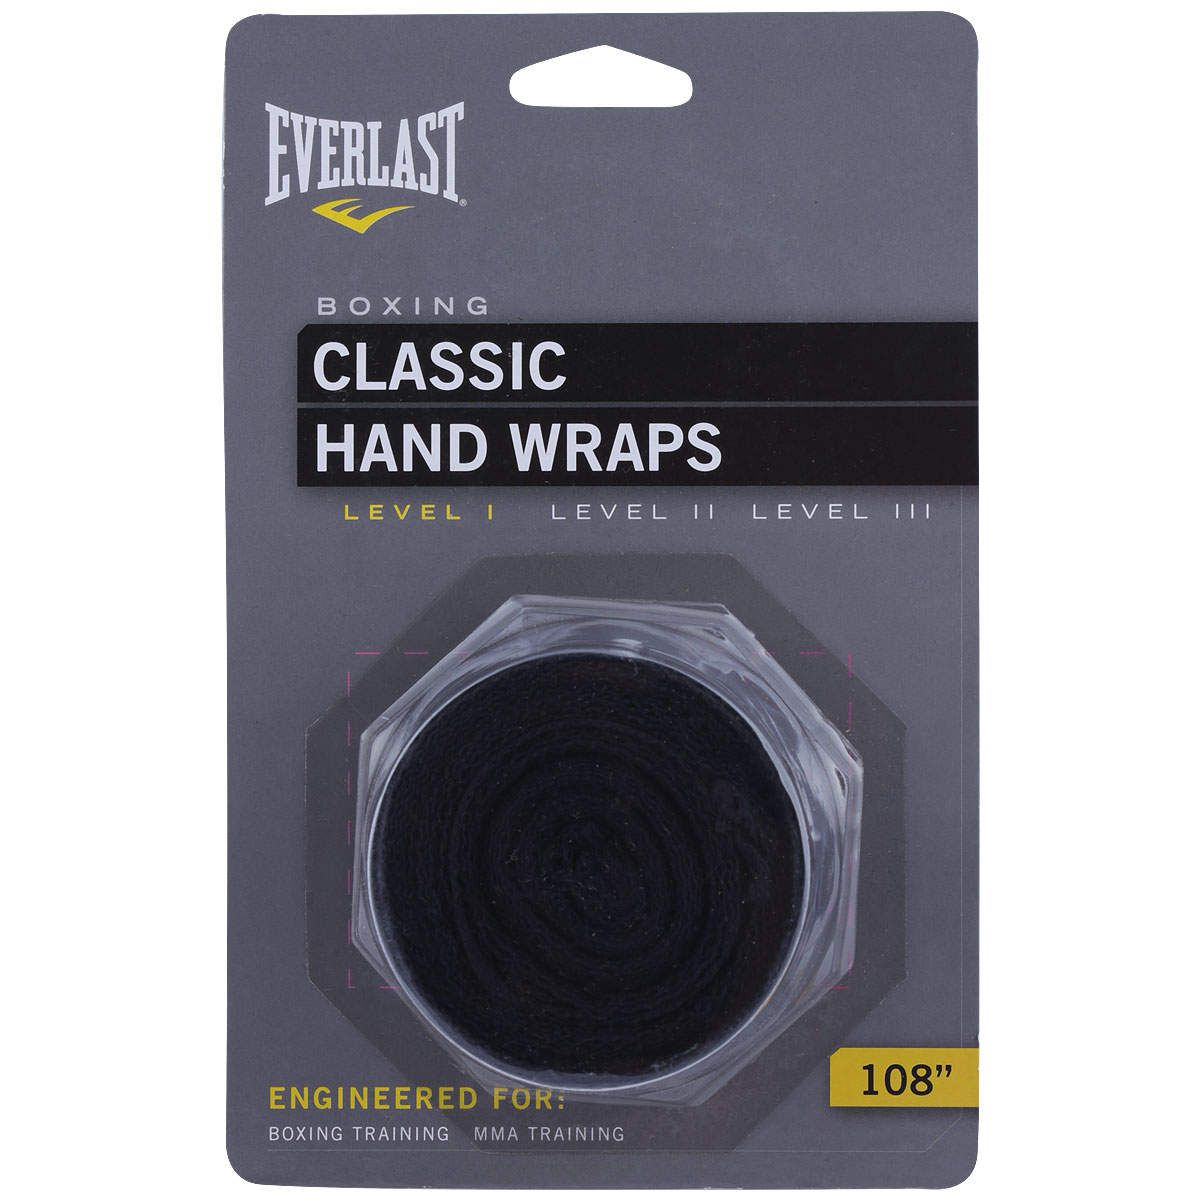 Kit  Everlast Bandagem 108 inches Preta Protetor Bucal Simples Branco Luva Elite Pro Style 12oz Dourada